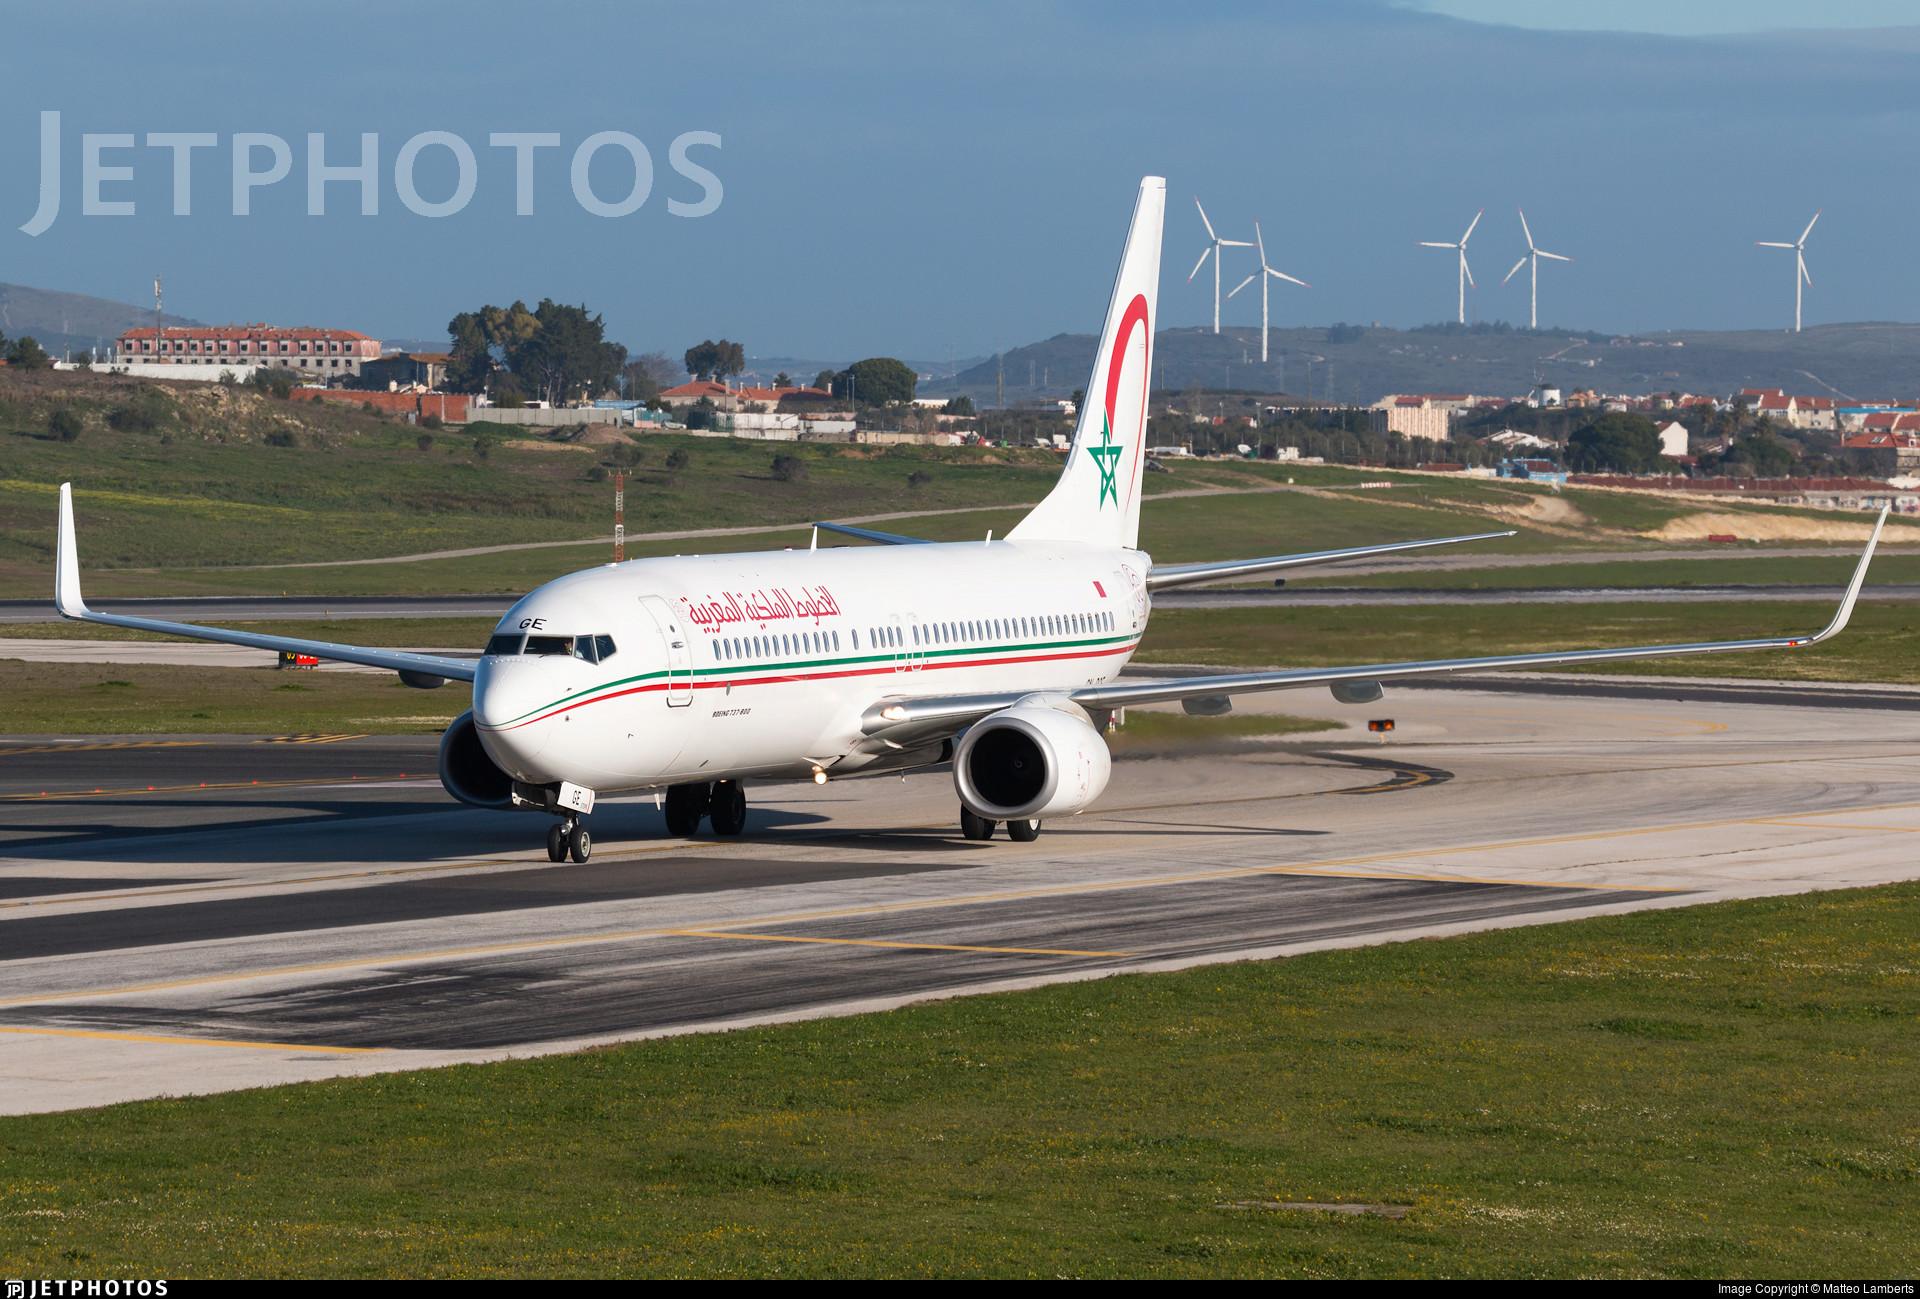 Royal Air Maroc - Page 21 48d43